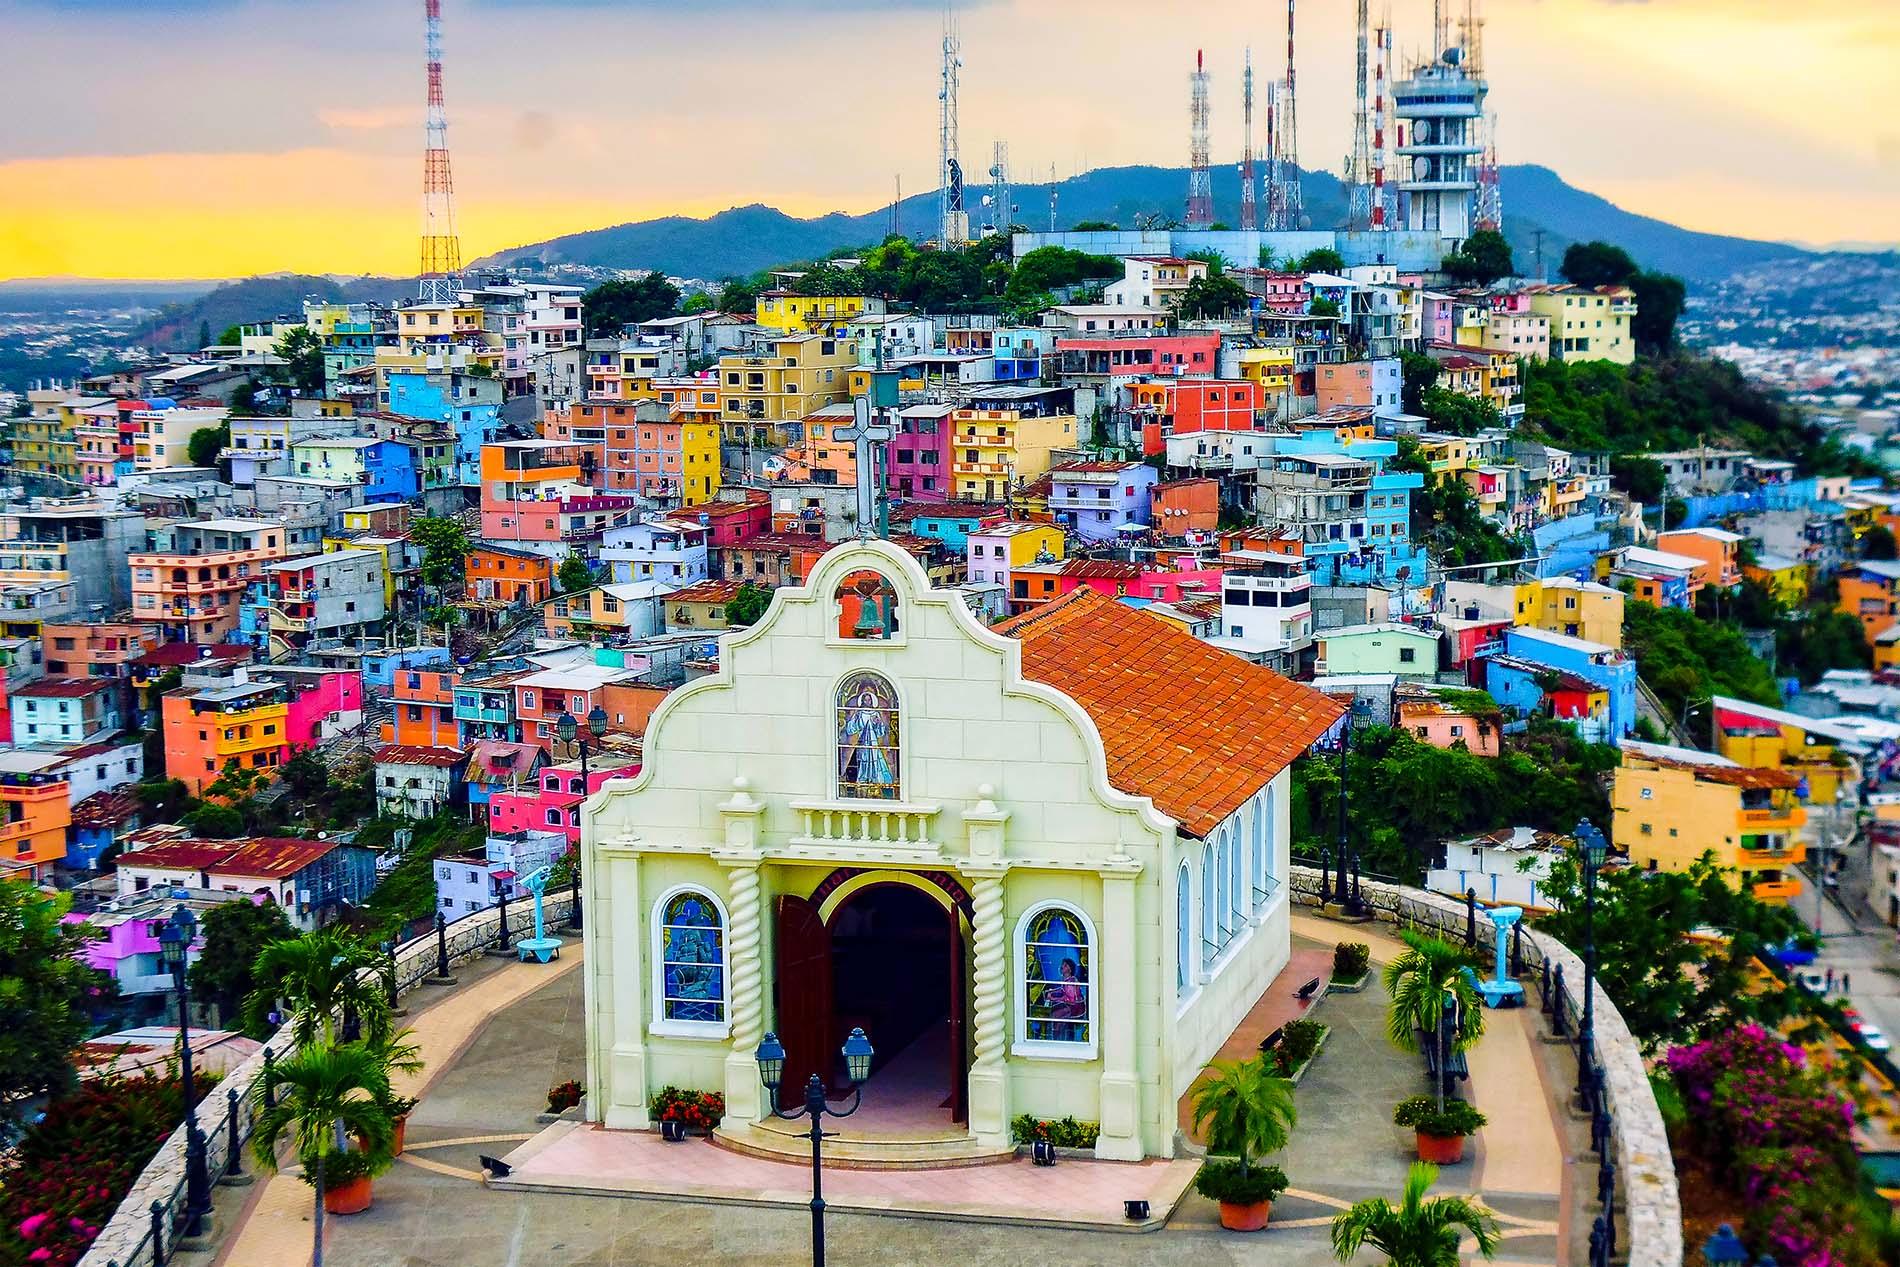 Bunte Häuser Guayaquil Shutterstock Klein - Galapagos Pro